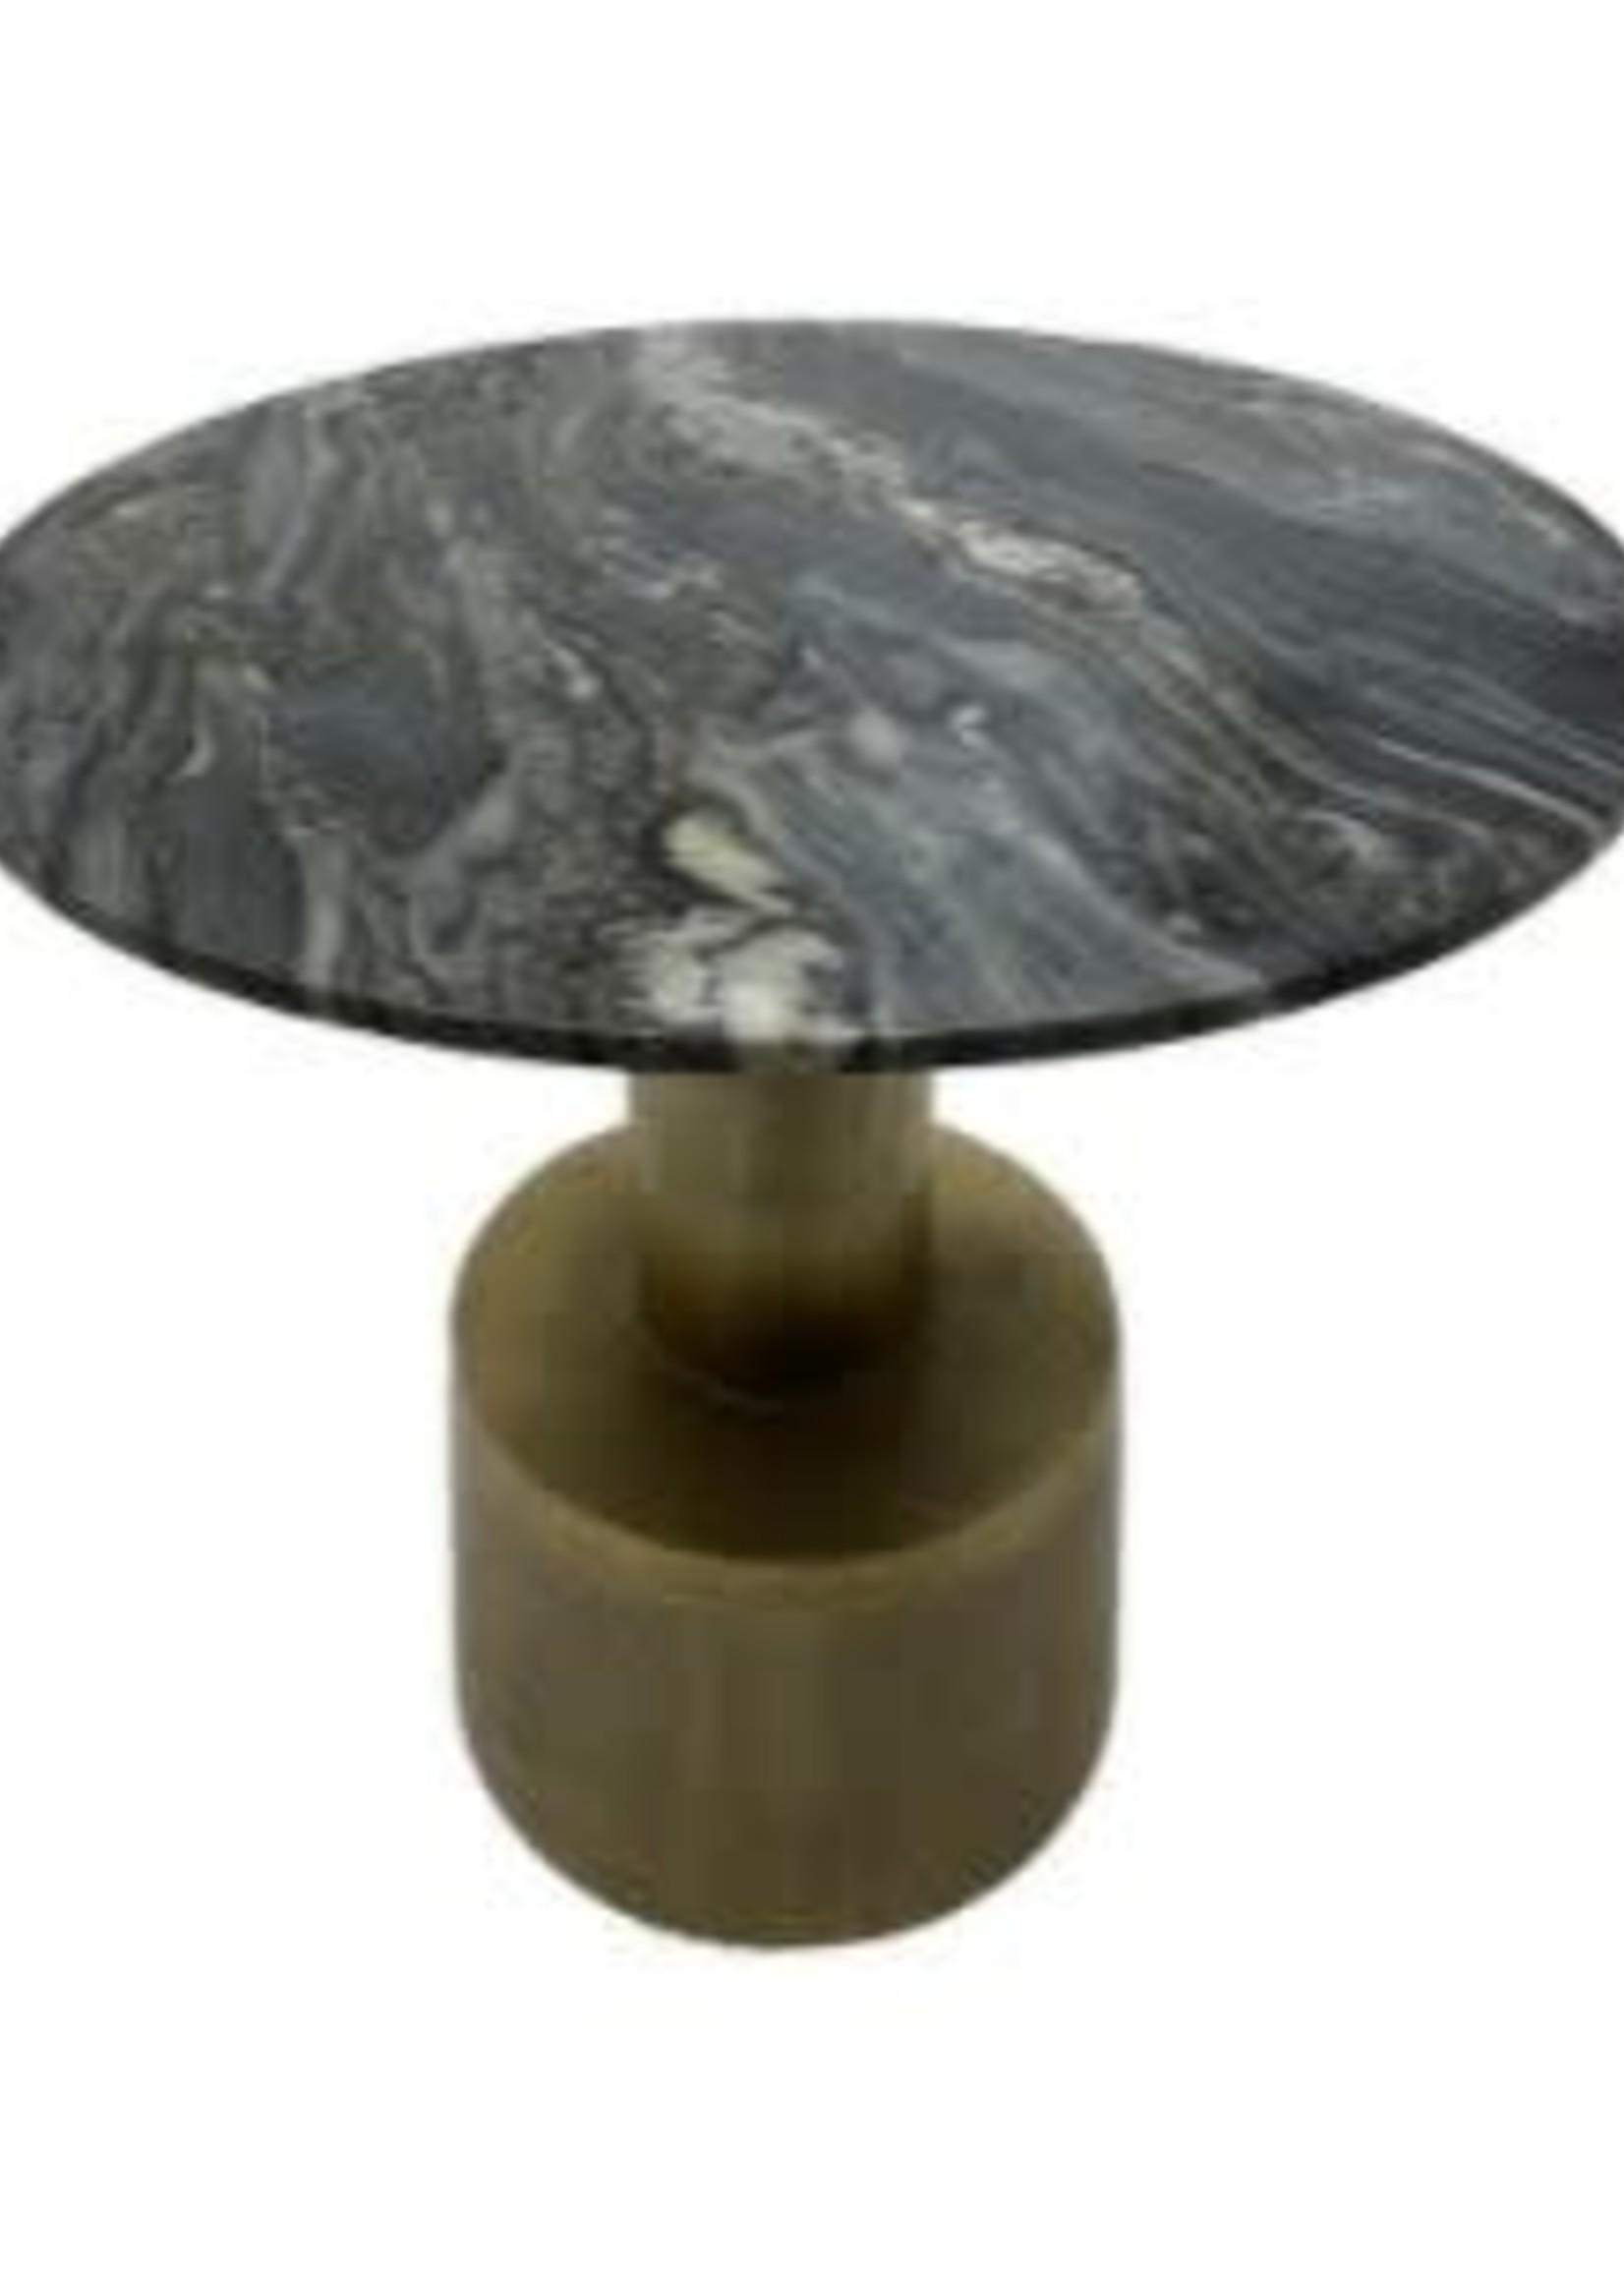 Moods Collection Ronde tafel groen marmer&antique goud alu 60x60x58